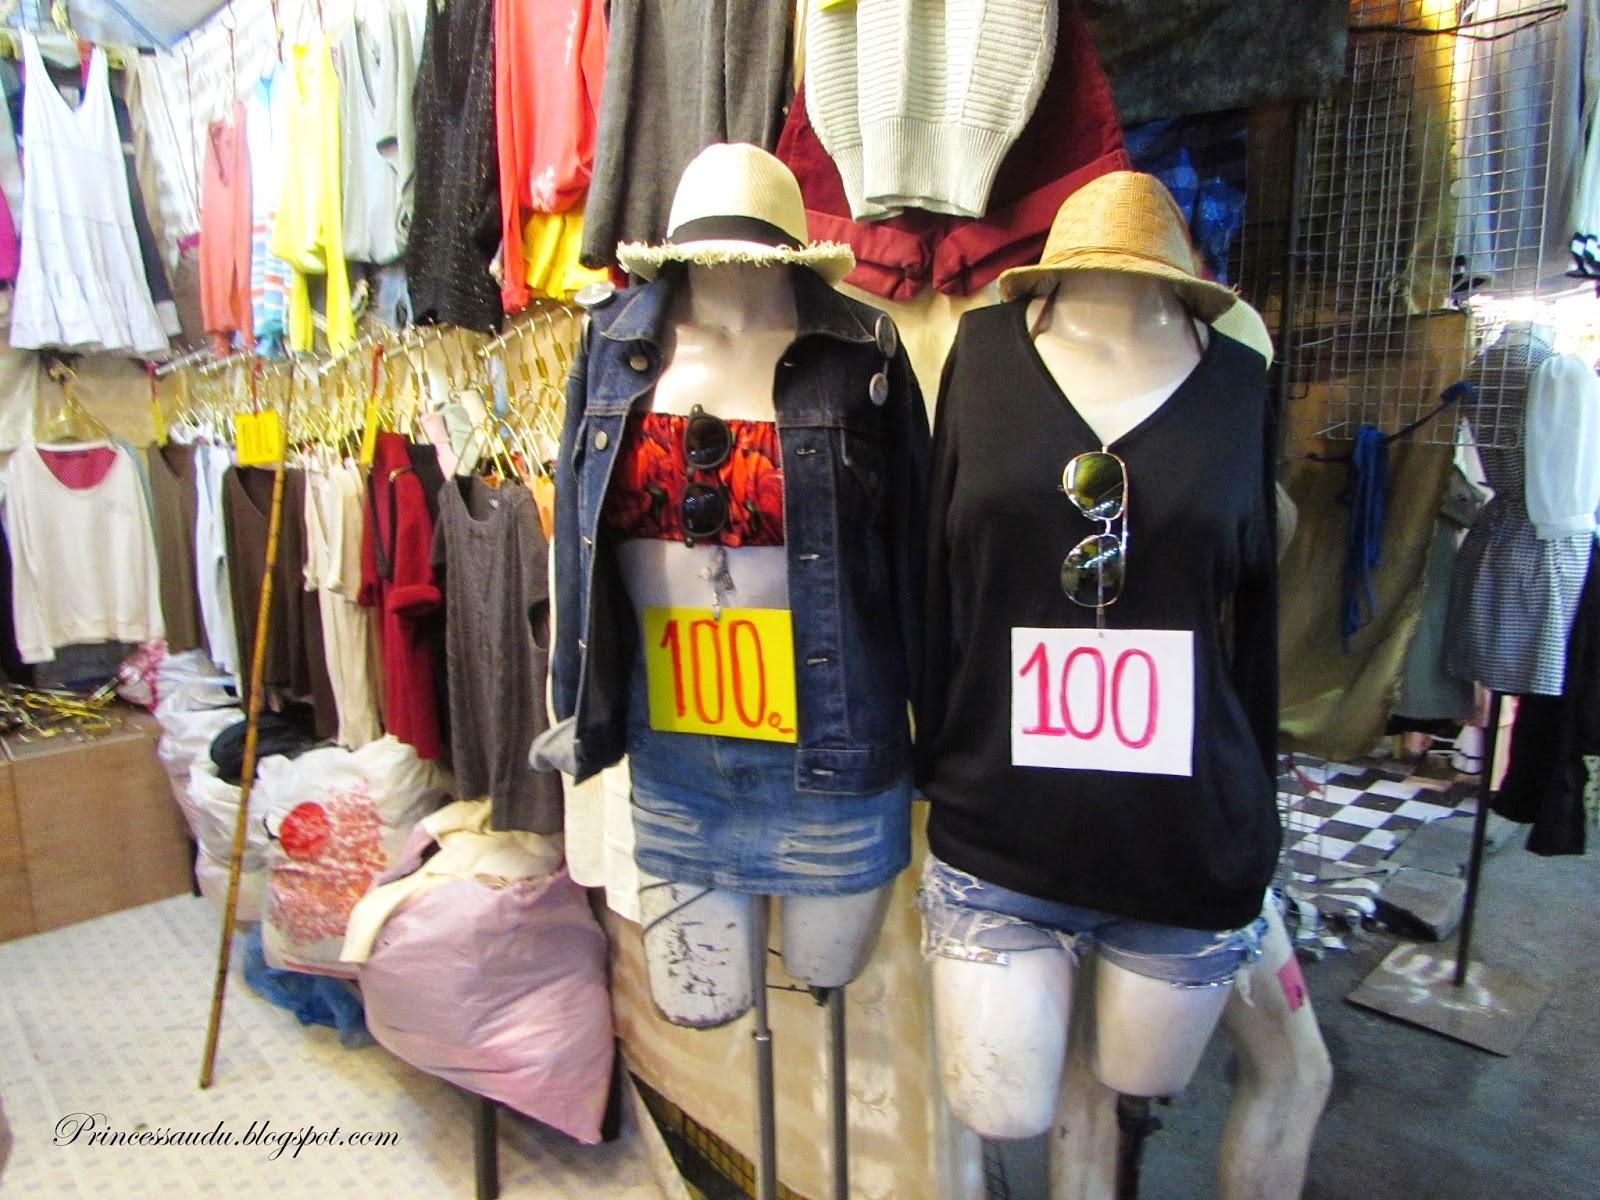 Thailand, Bangkok, travel destination, Thai food, transportation, shopping, street markets